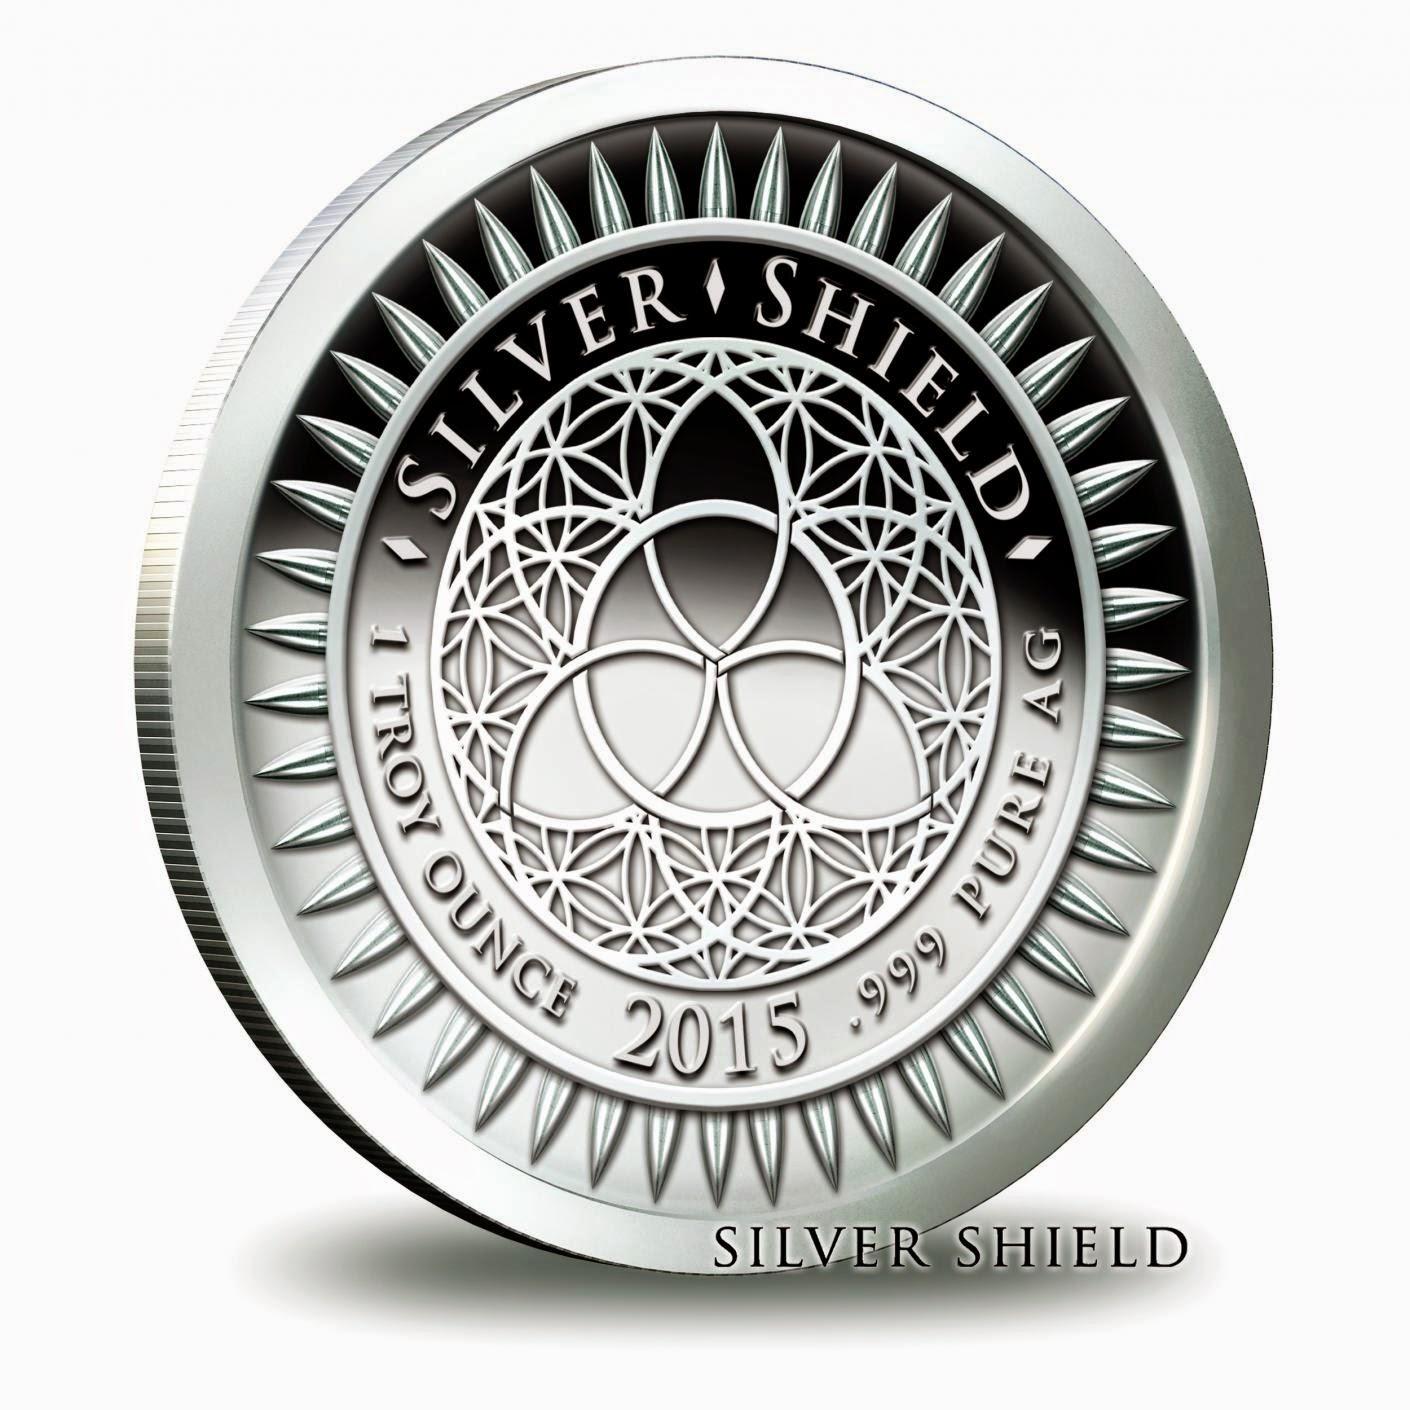 2014 Silver Shield Ag Bull 1 oz Silver Round//Coin in airtite